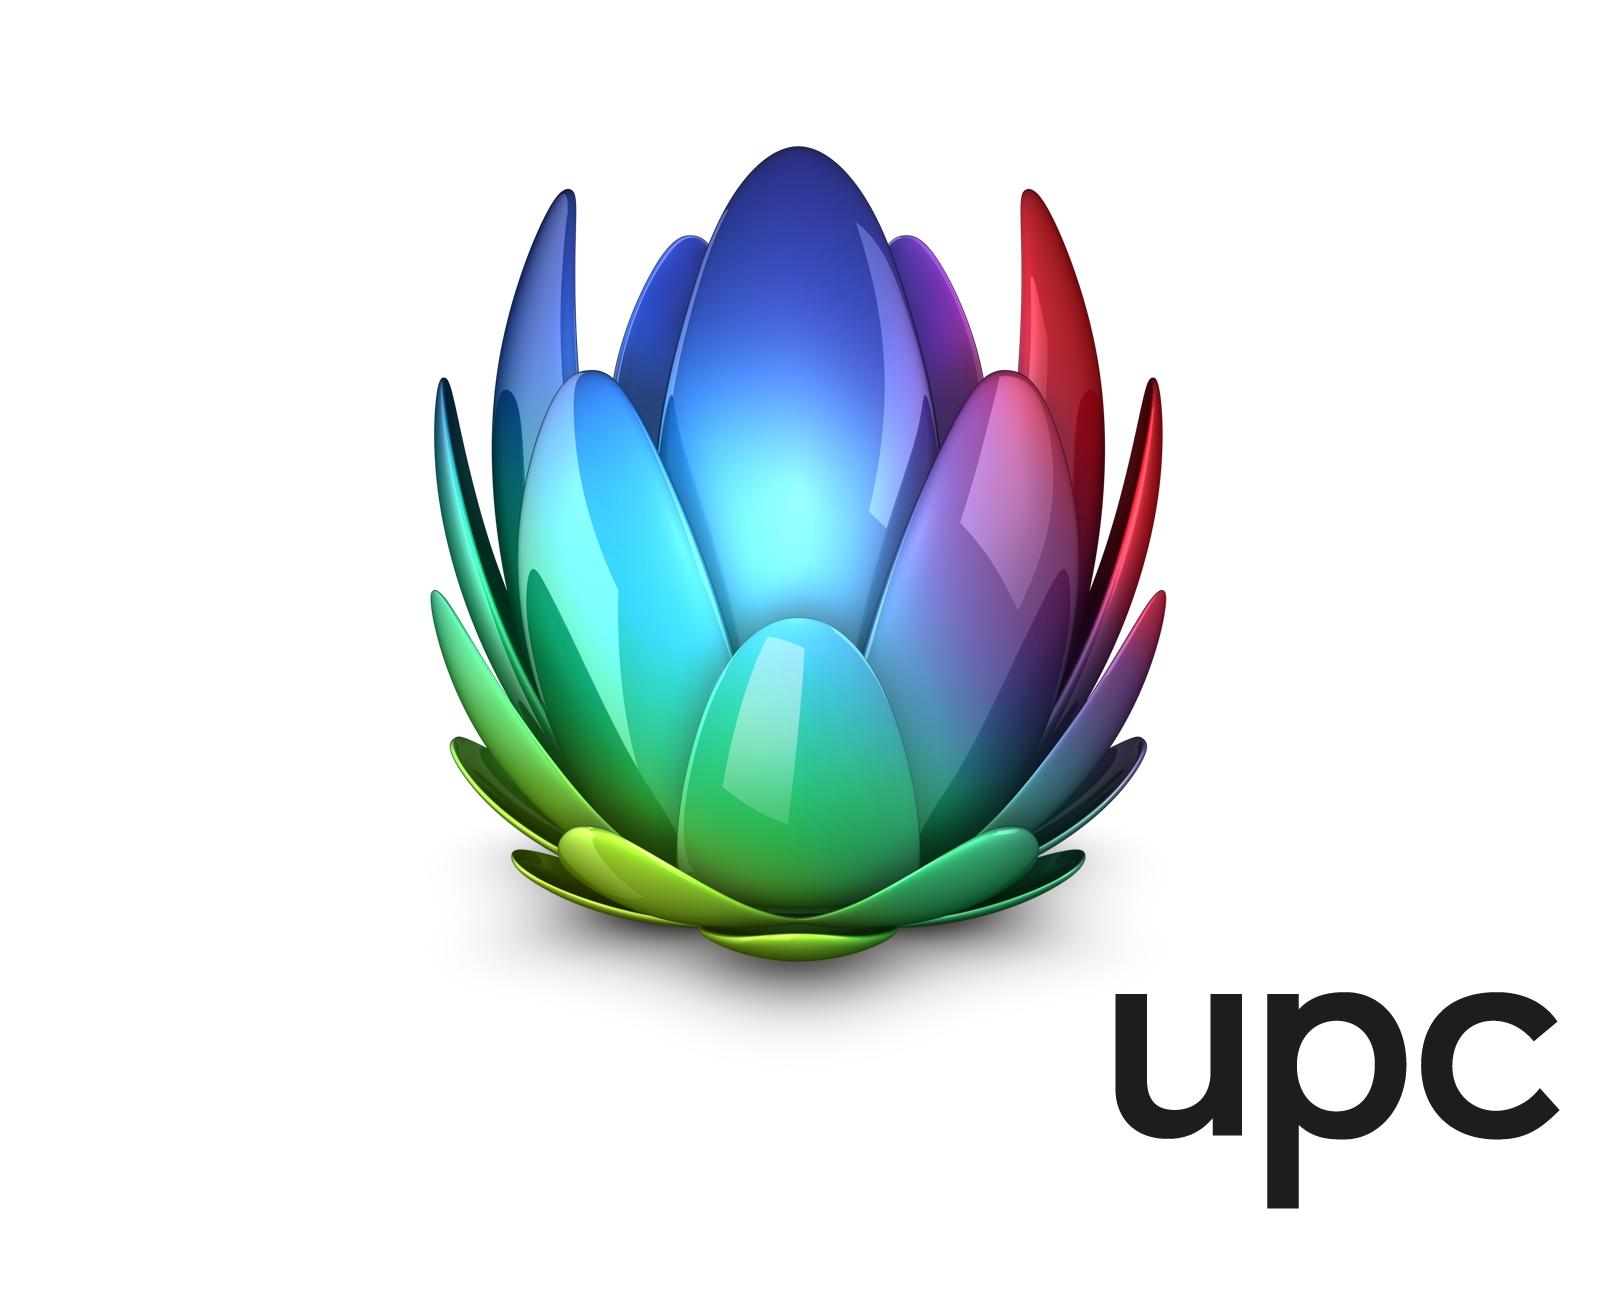 upc cablecom devient UPC Upc_multicolored_logo_screen_rgb_on_white_hi